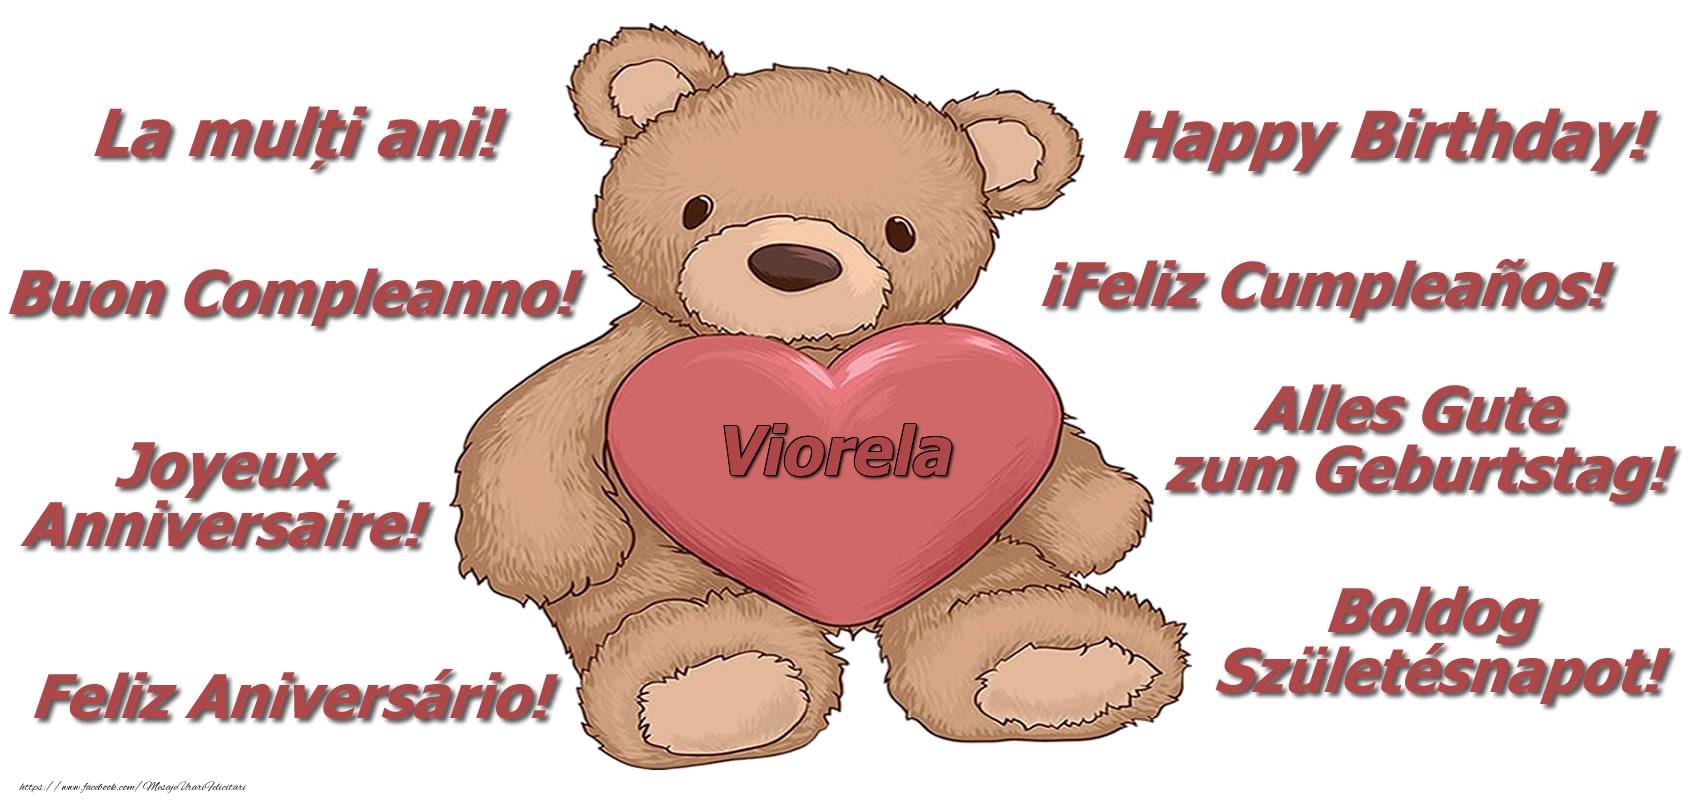 Felicitari de zi de nastere - La multi ani Viorela! - Ursulet